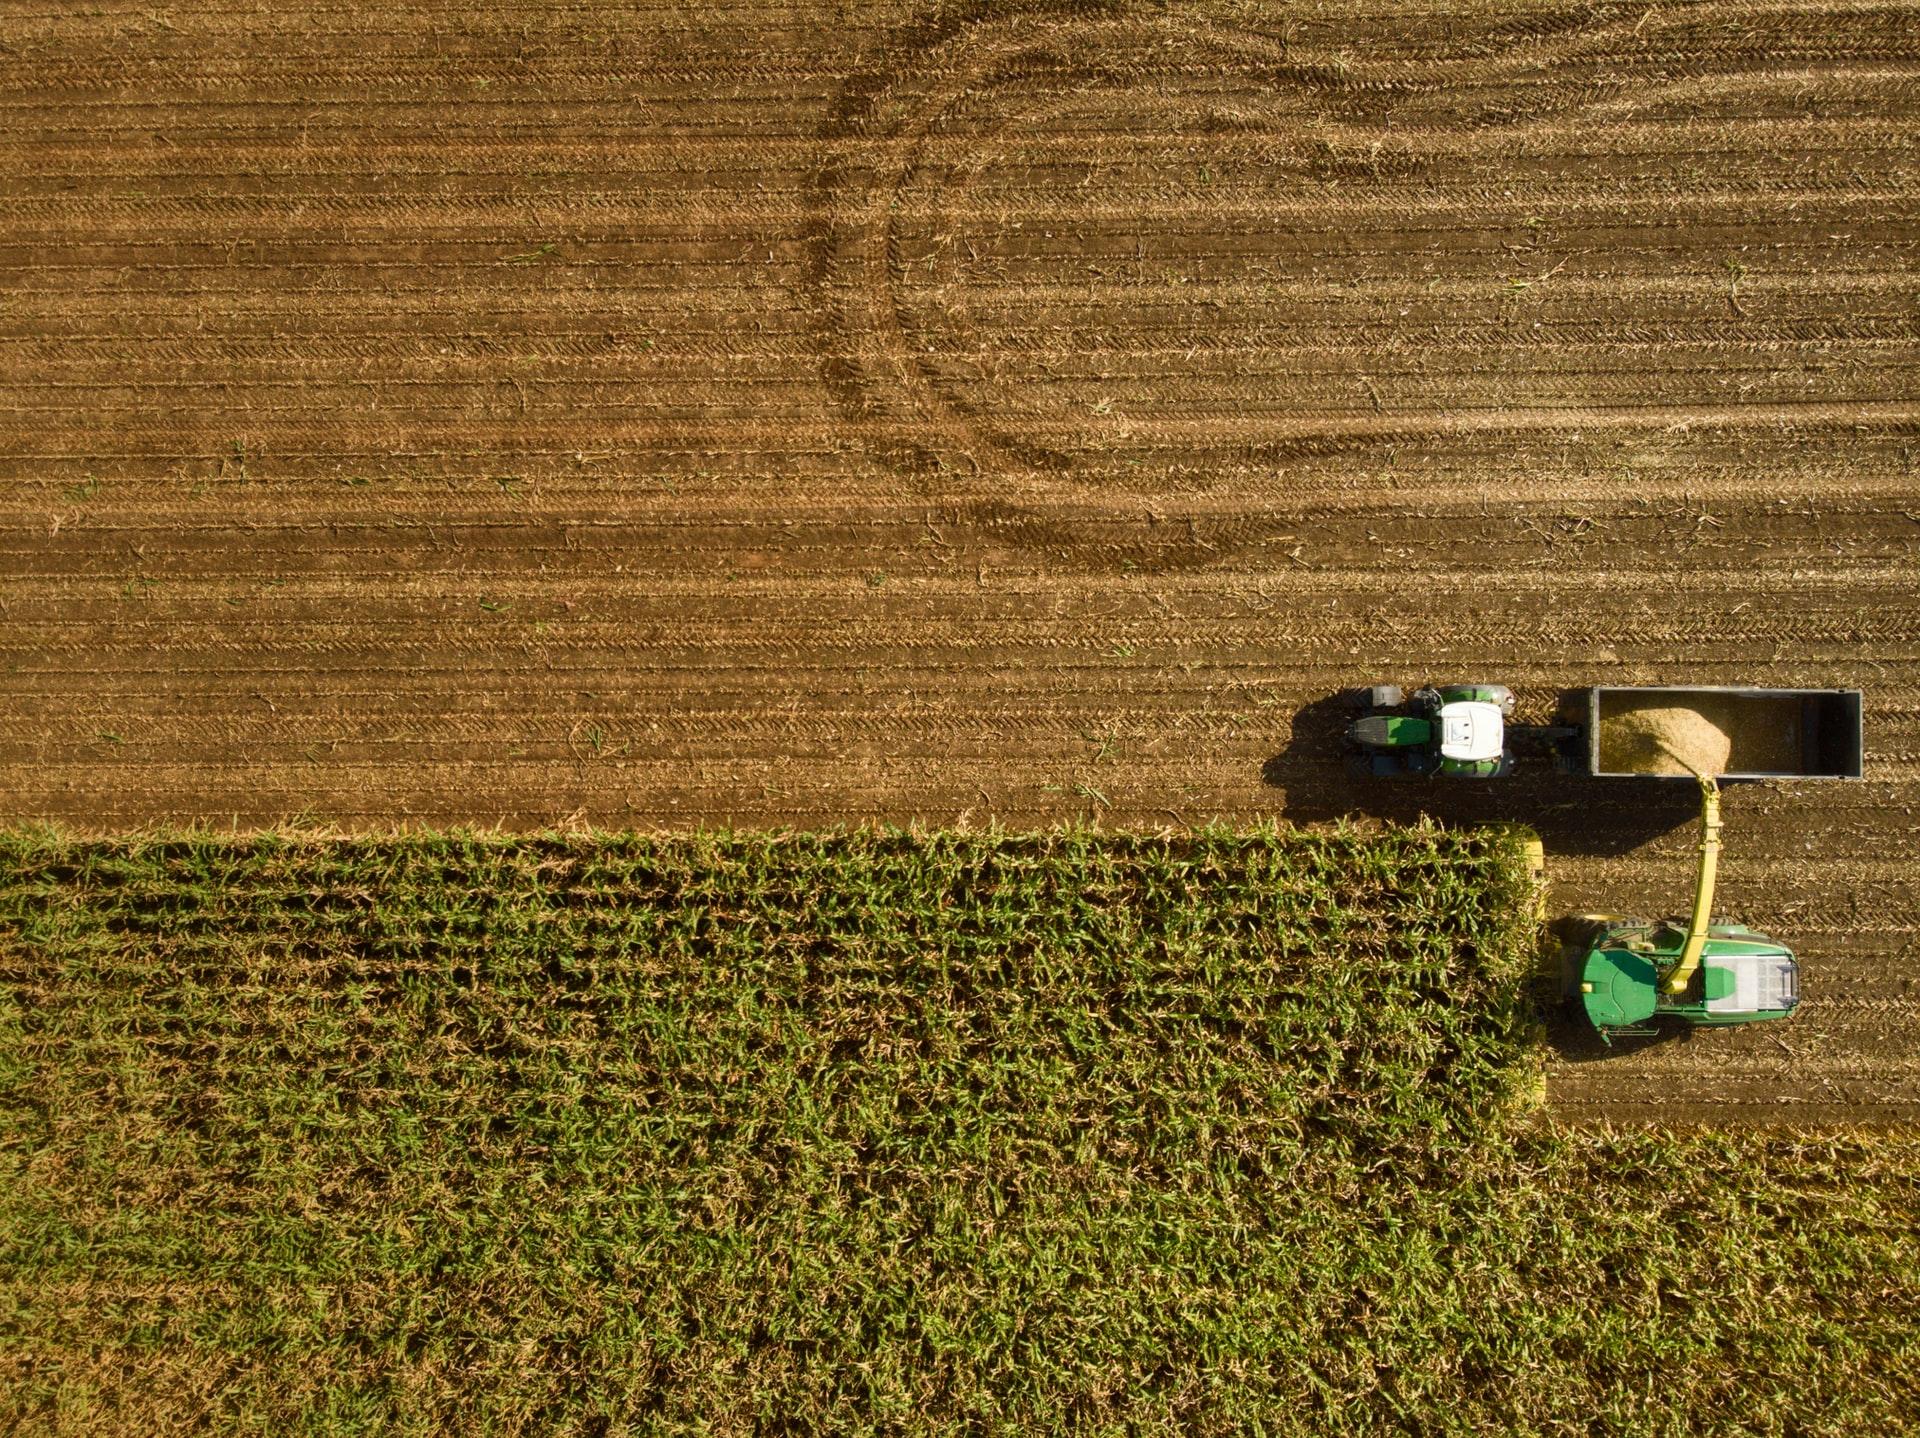 A agricultura digital está transformando os sistemas agroalimentares